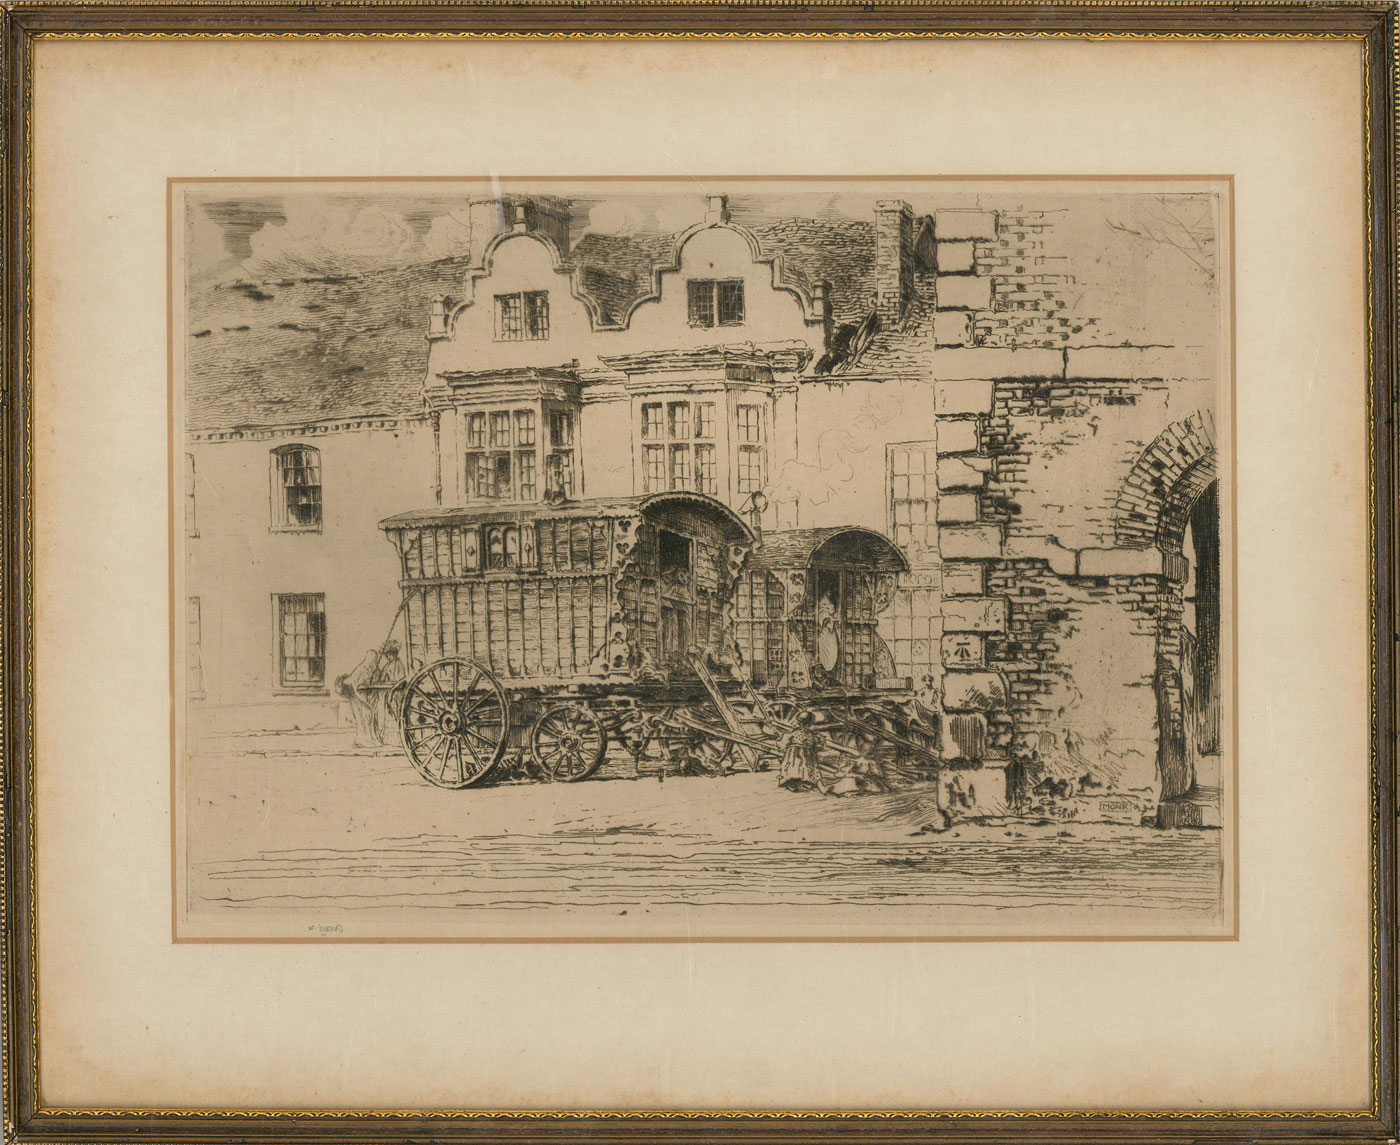 William Monk (1863-1937) - Framed 19th Century Etching, Traveller's Caravan